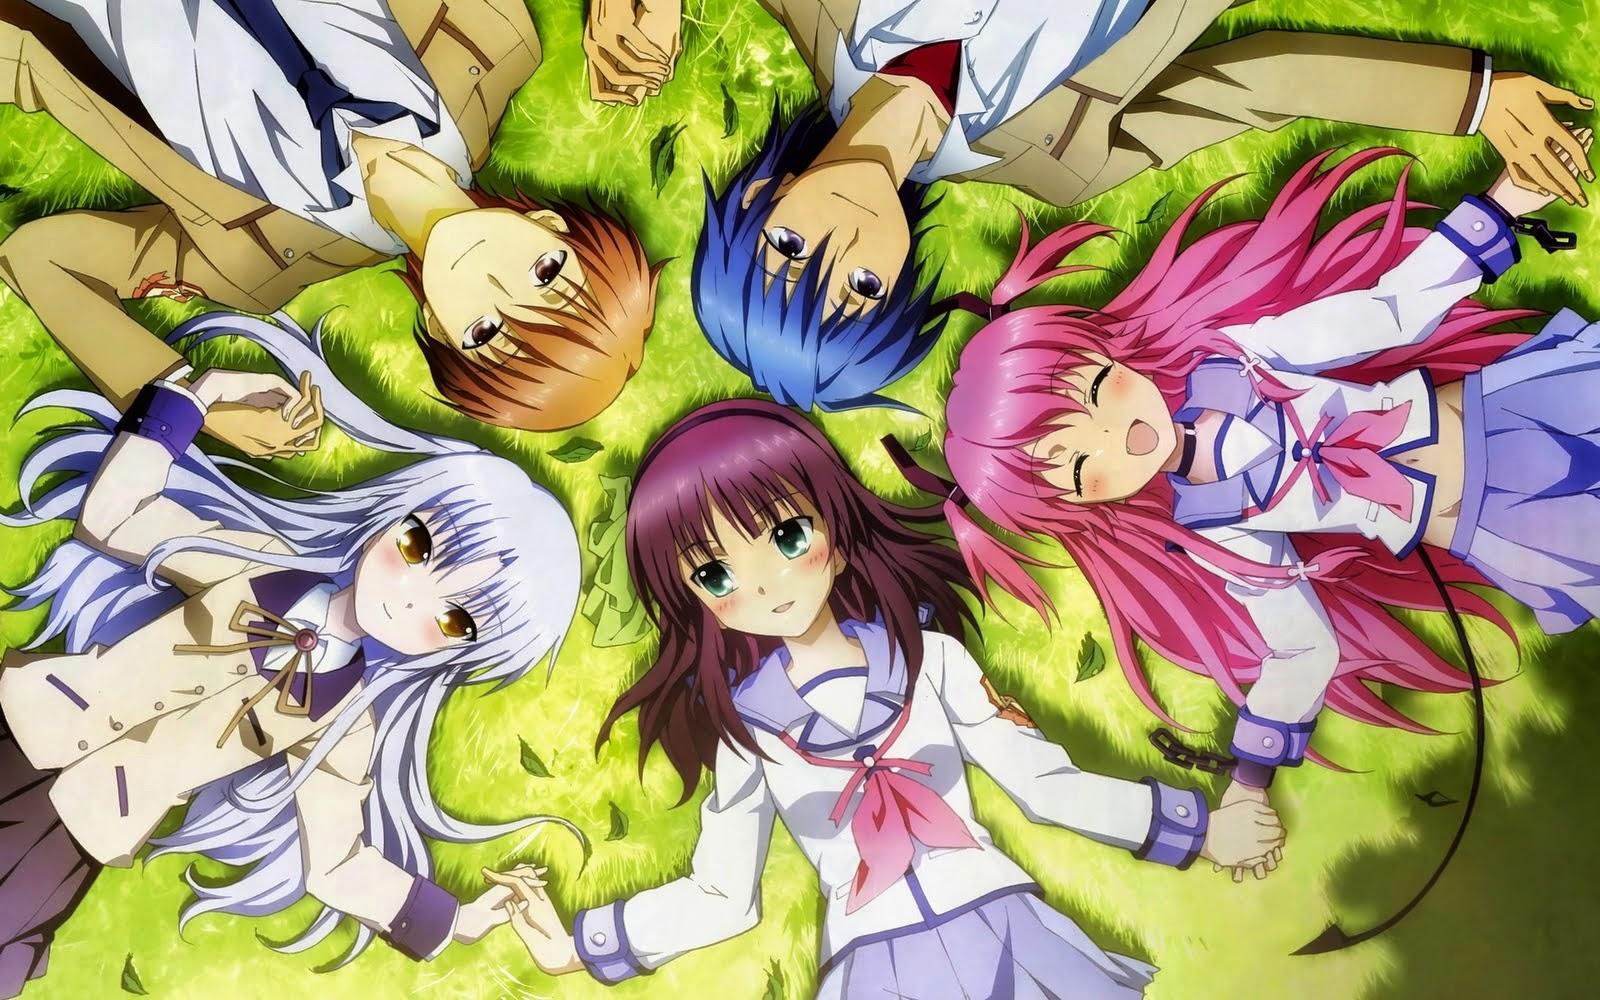 Foto Anime Yang Lucu